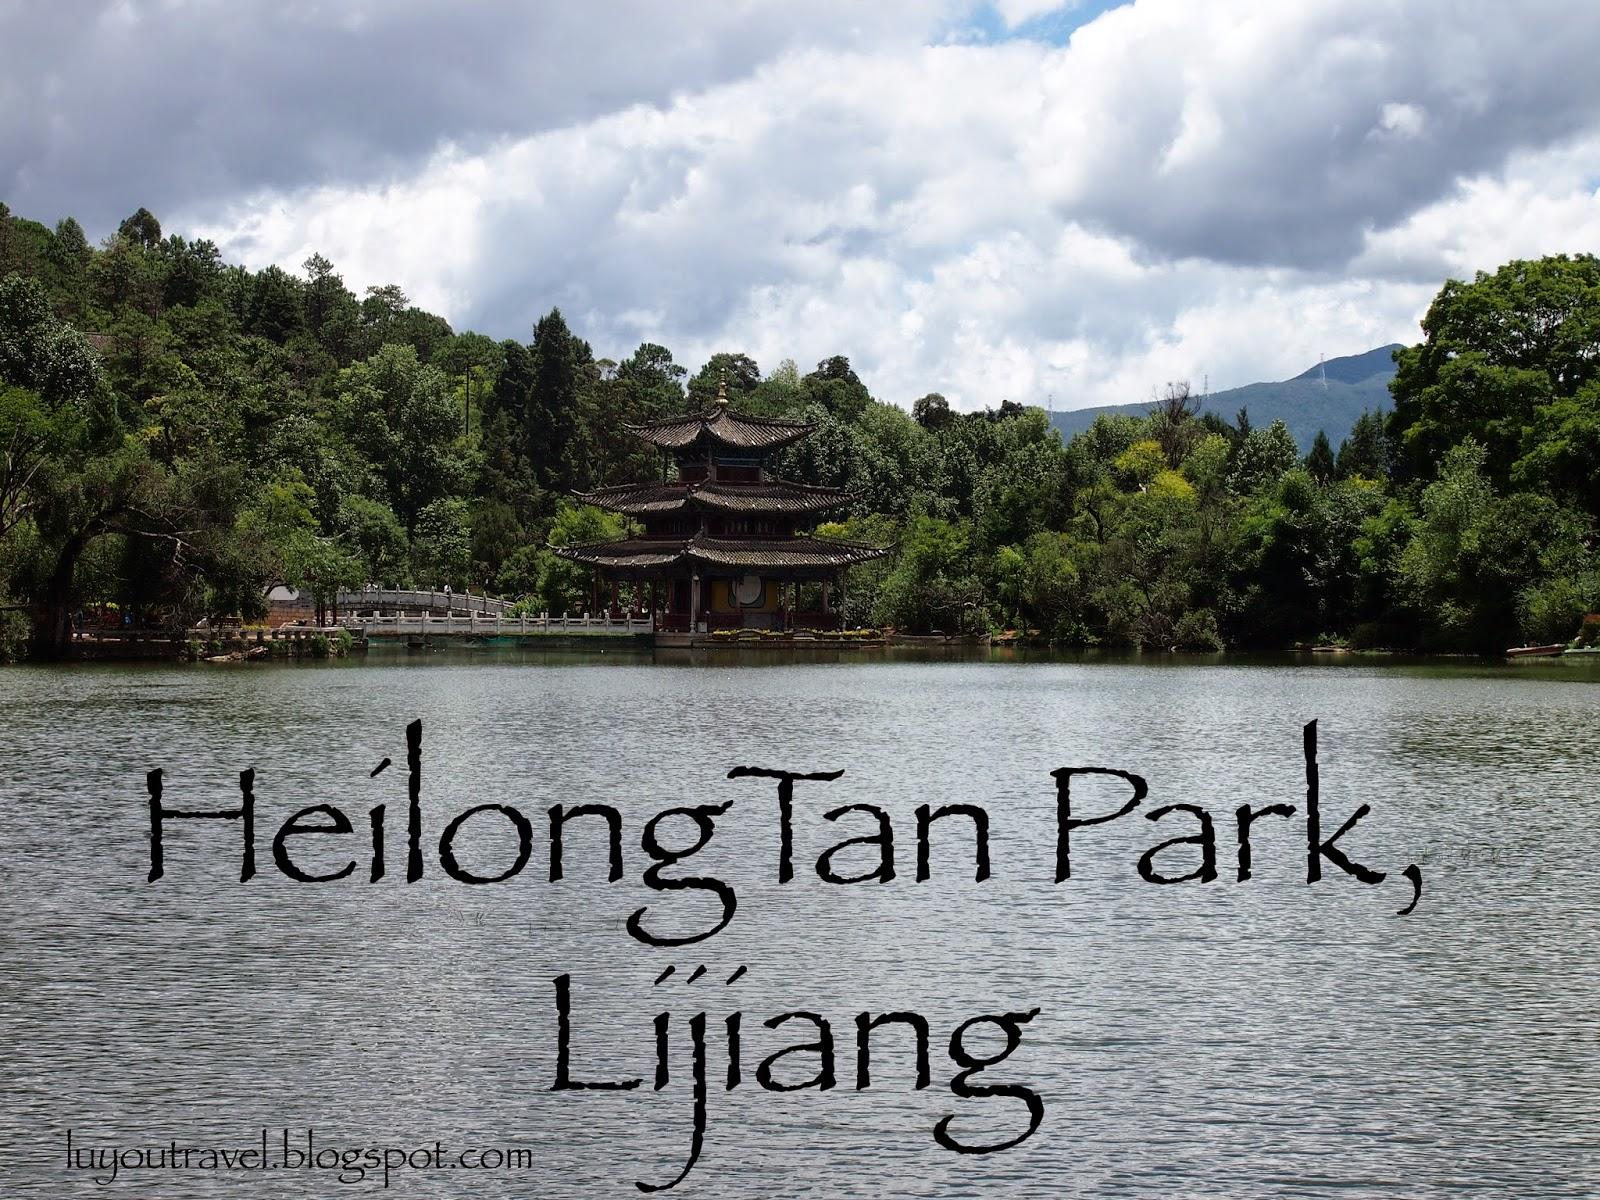 Heilongtan Park in Lijian